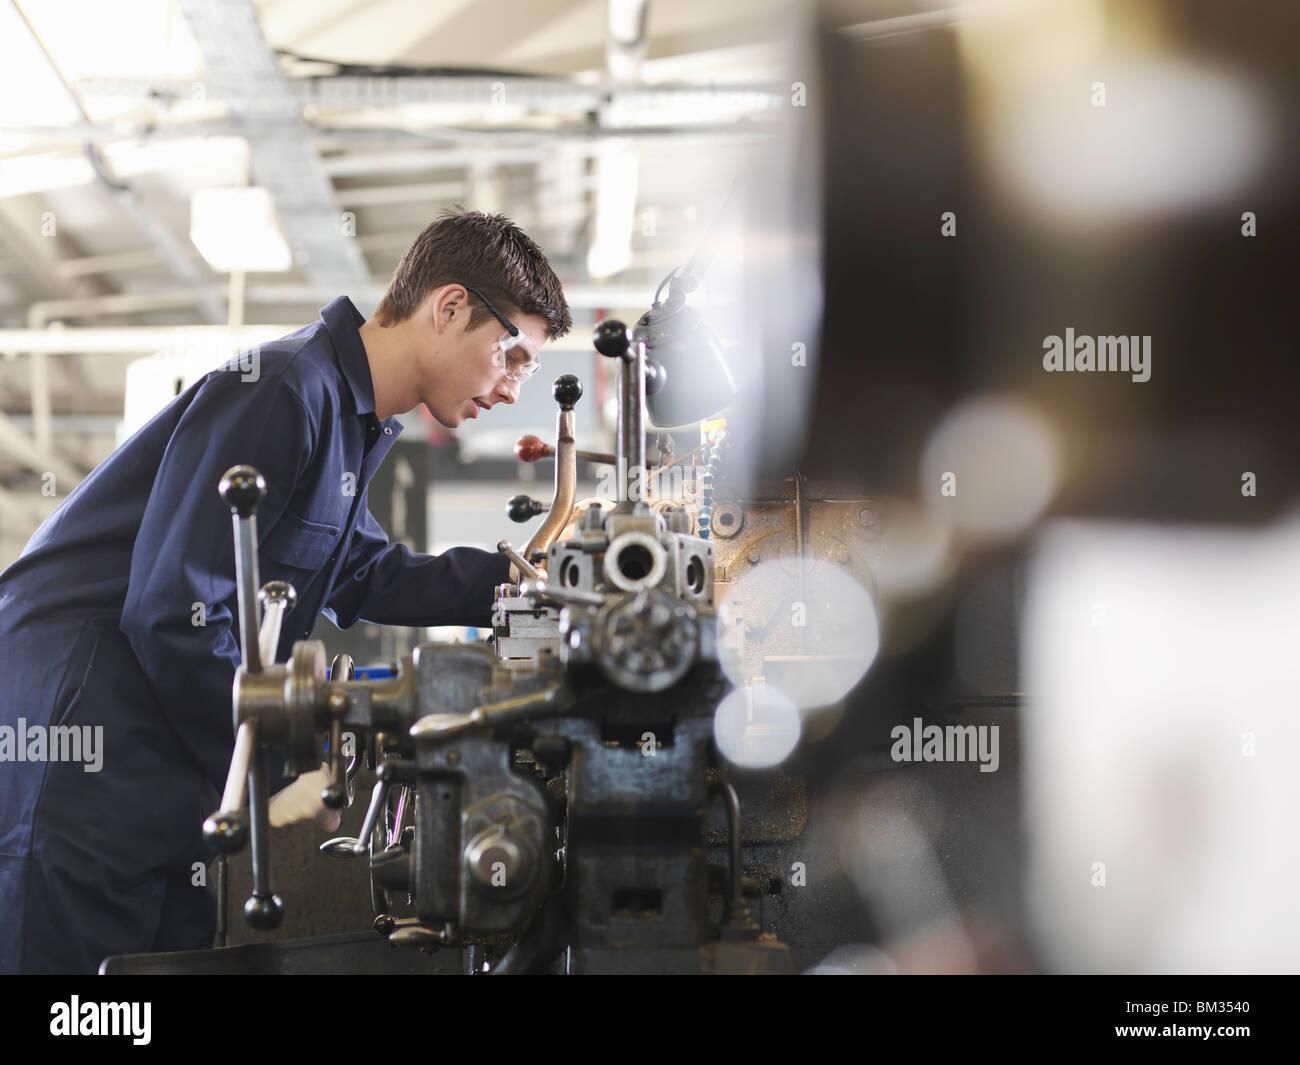 Apprentice Working With Basic Lathe - Stock Image